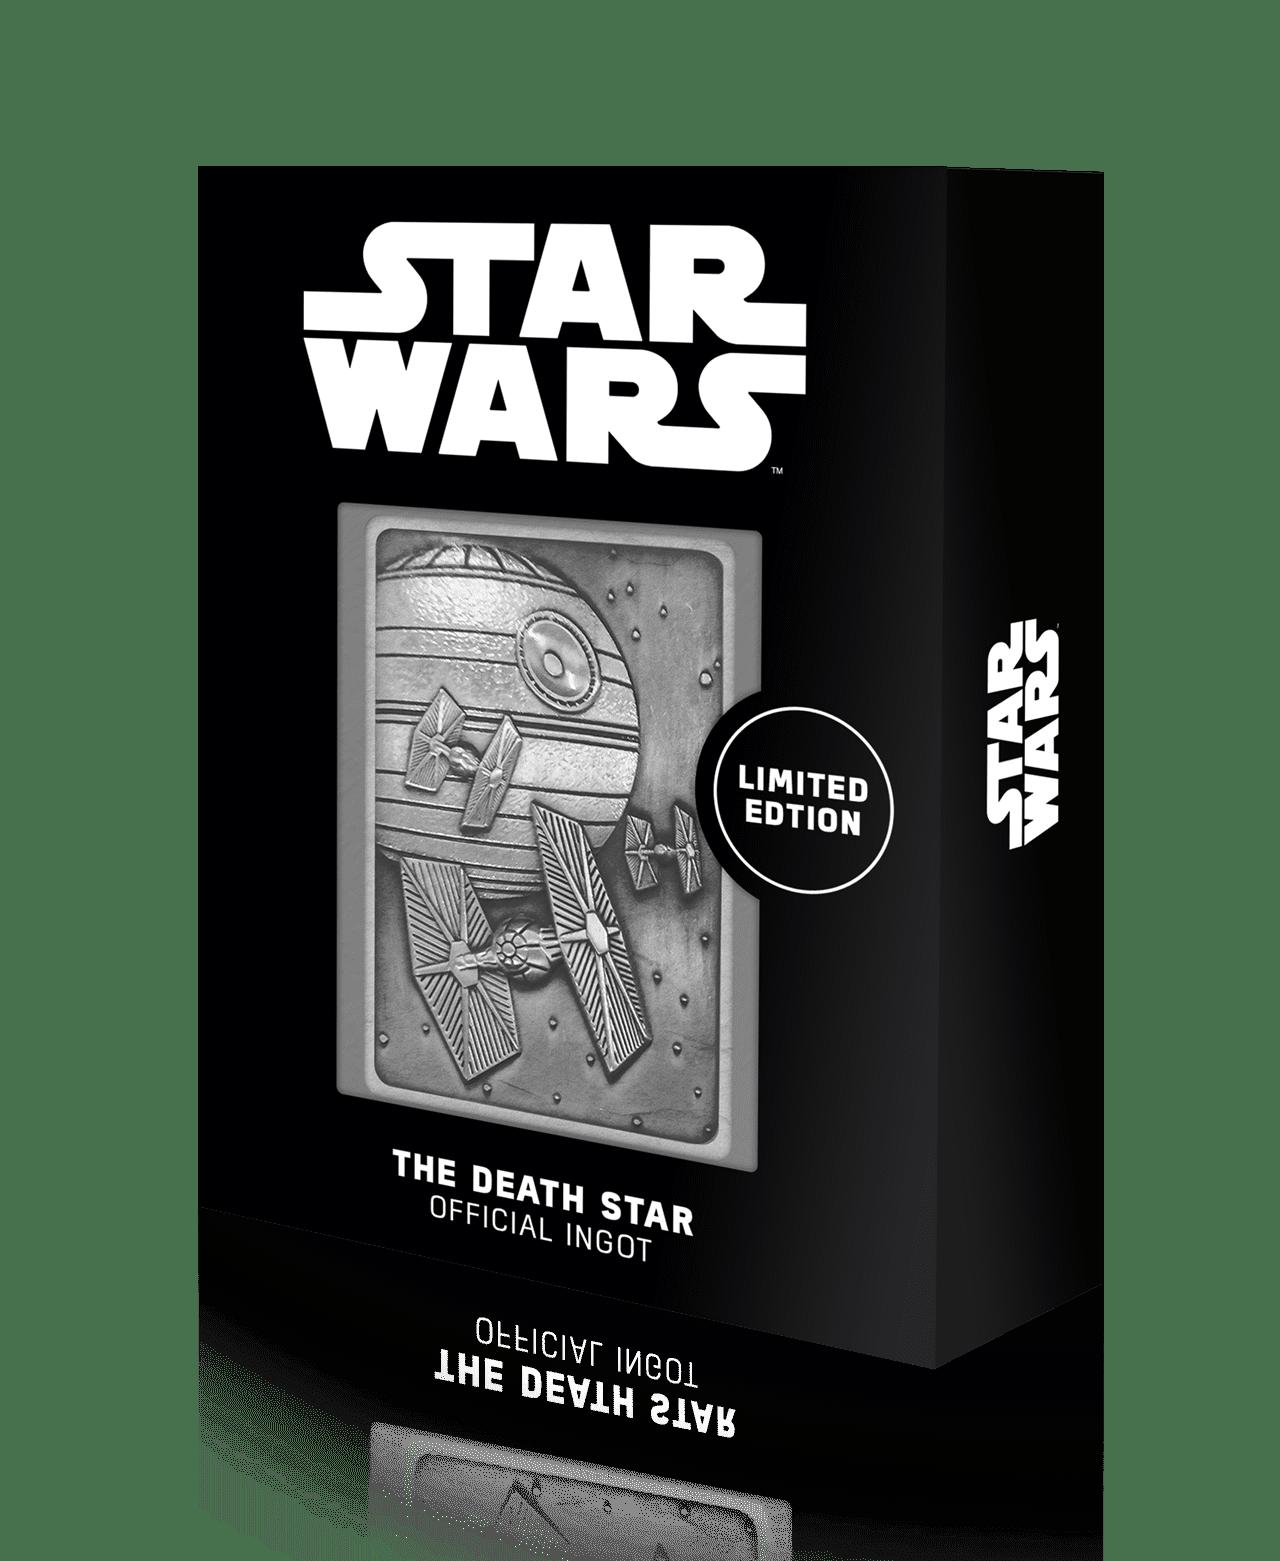 Death Star Scene: Star Wars Limited Edition Ingot Collectible - 1